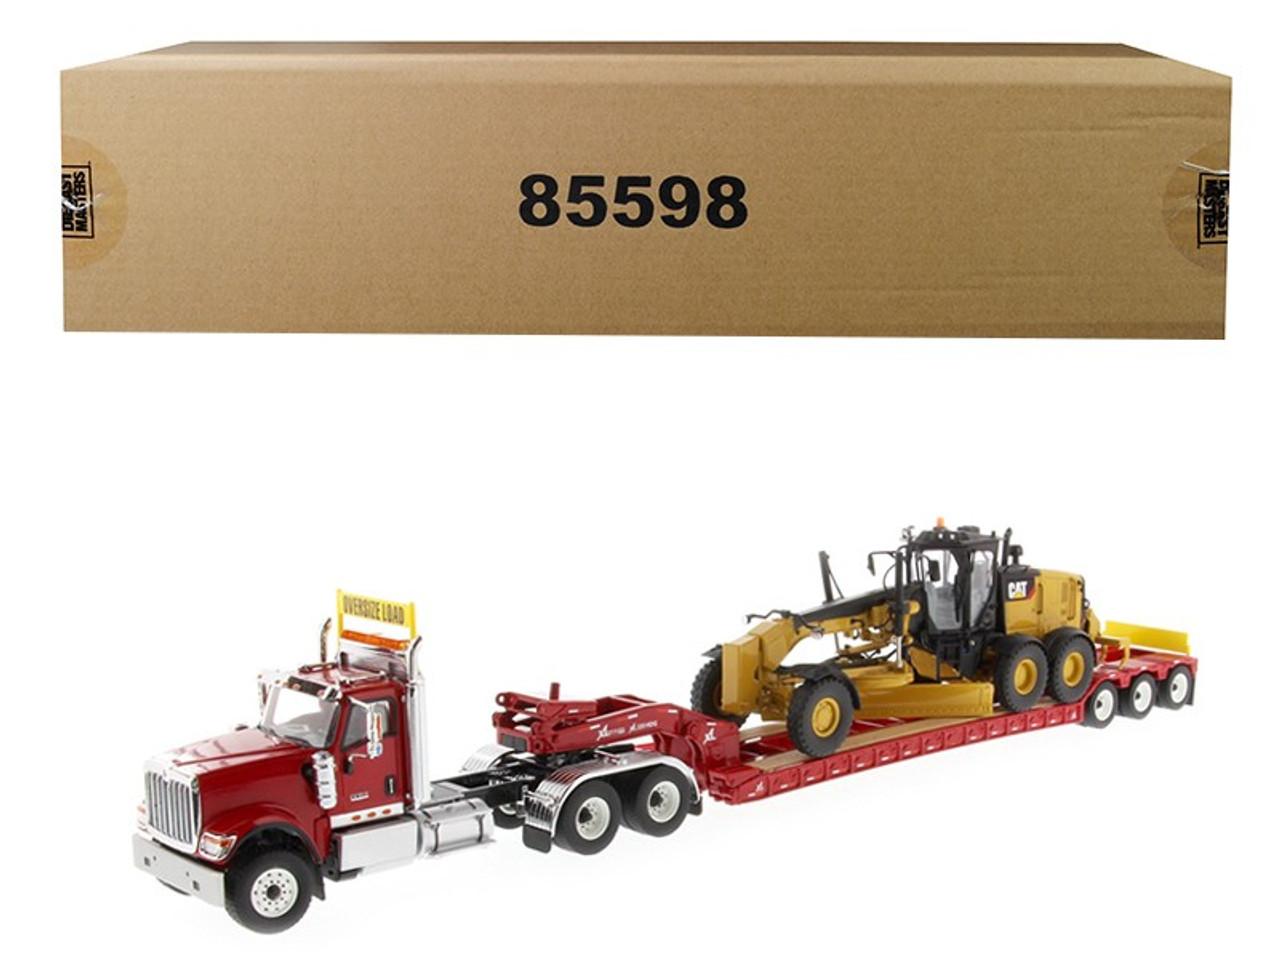 1//50 BY DIECAST MASTERS 71016 INTERNATIONAL HX520 RED XL 120 LOWBOY TRAILER